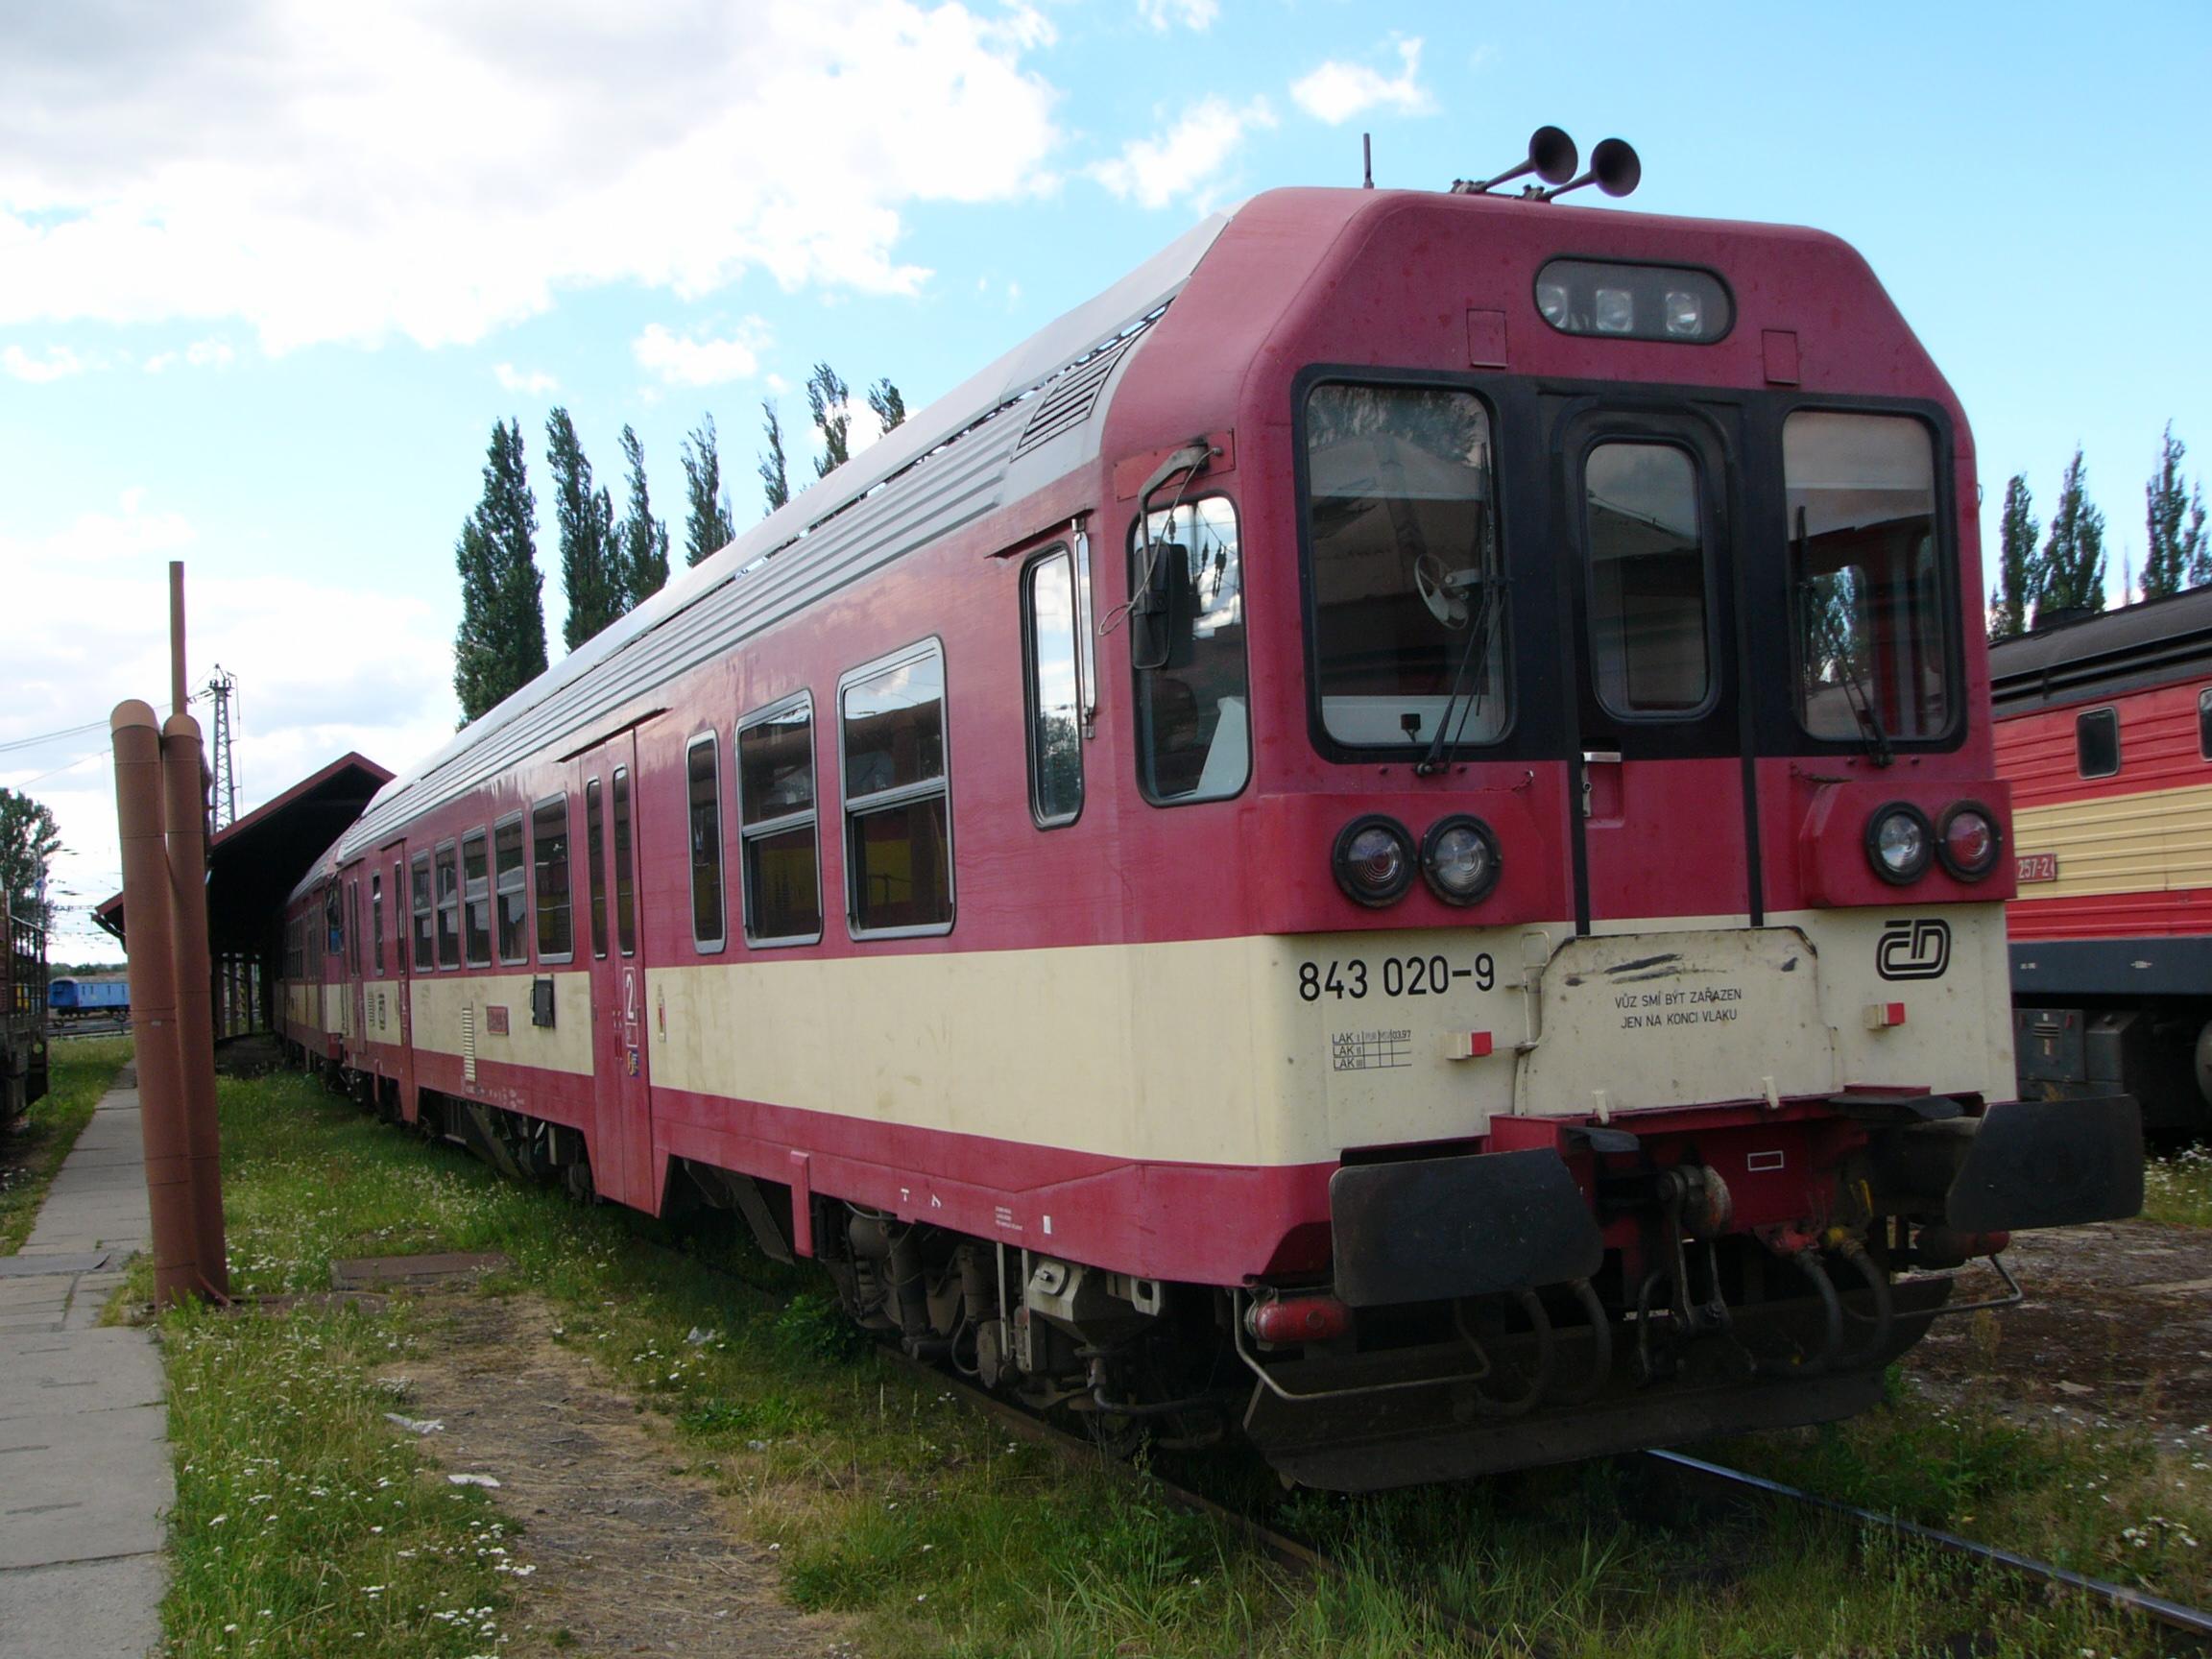 File:Motorovy vuz 843 020-9.jpg